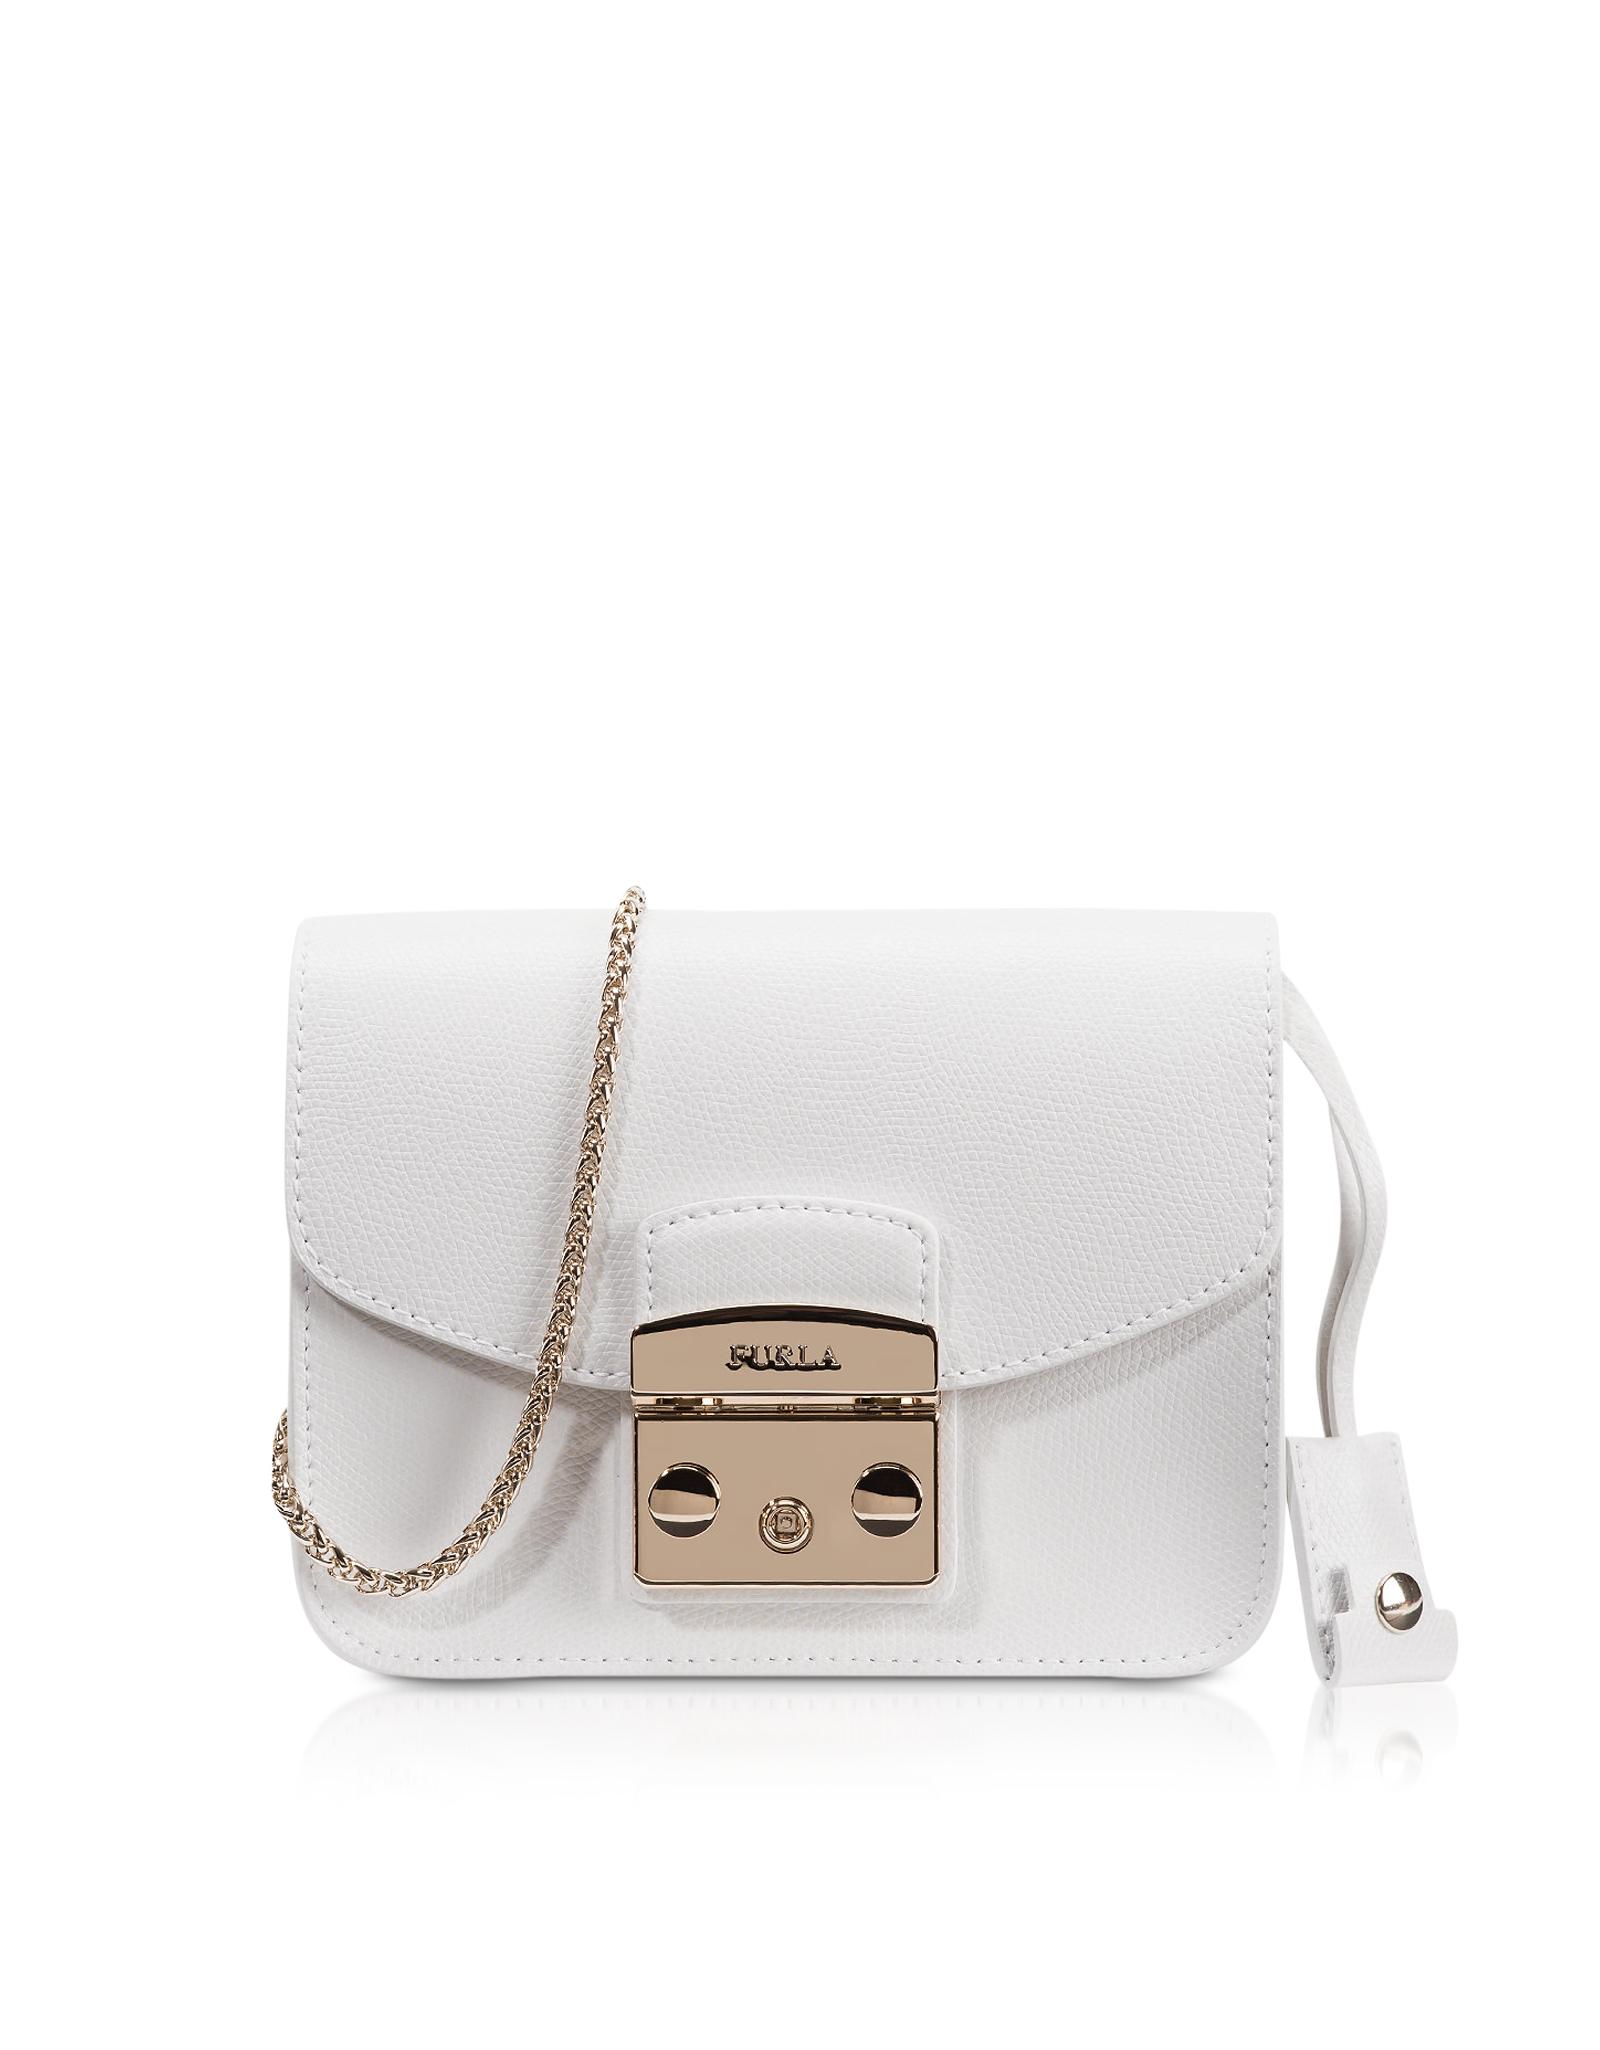 91a5b739cf1a Lyst - Furla Metropolis Chalk Leather Mini Crossbody Bag in White